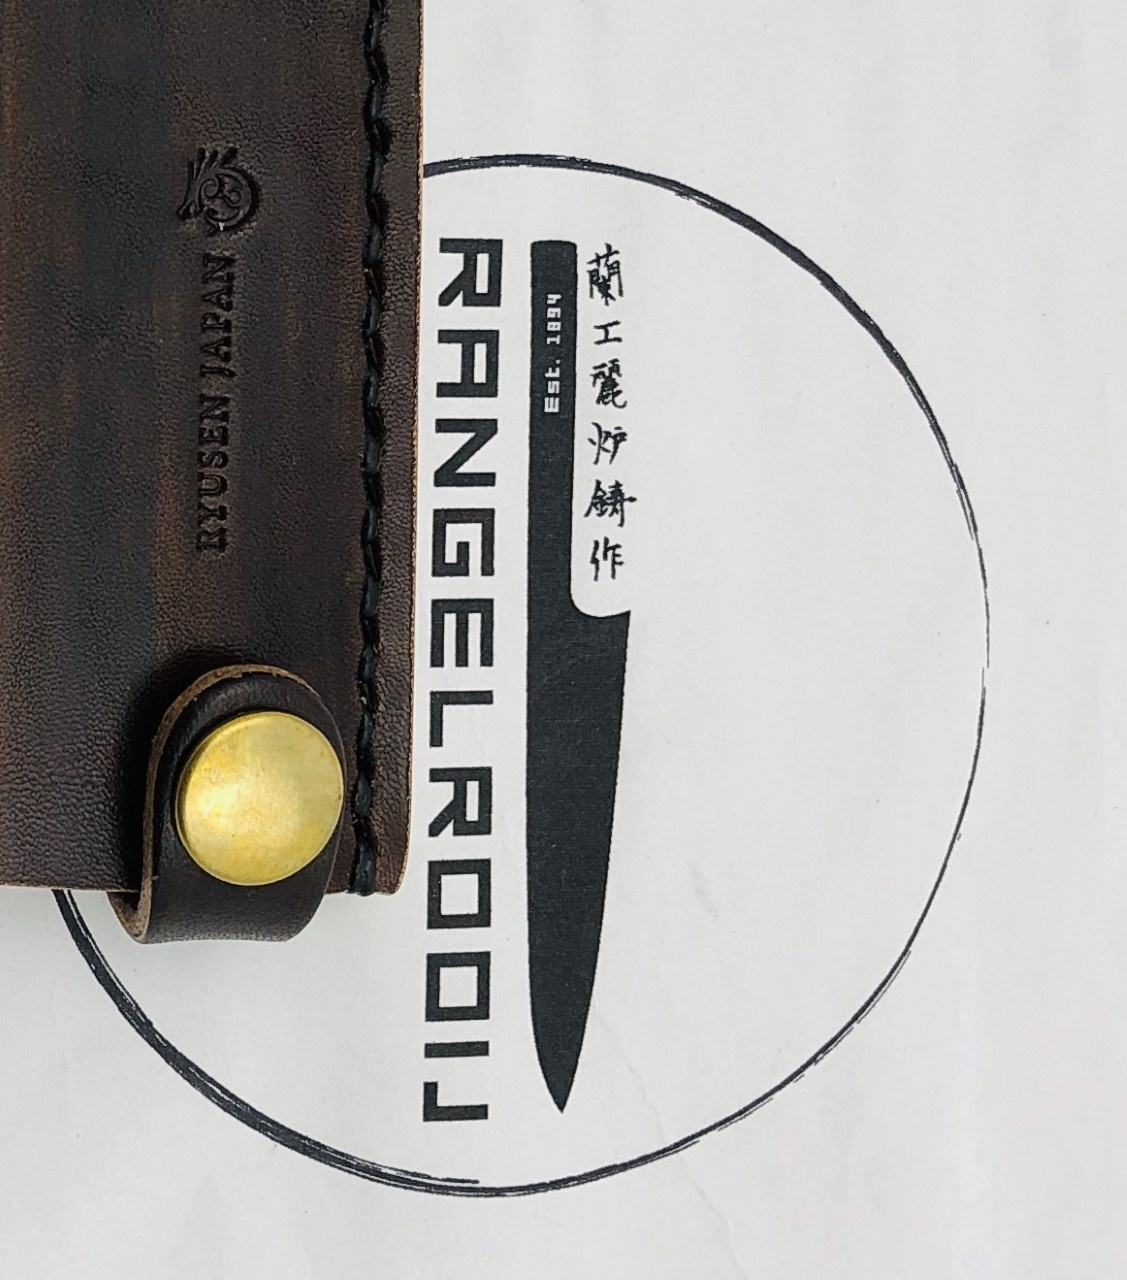 Takayuki RYUSEN leather sheath LS-204 175 mm santoku Brown